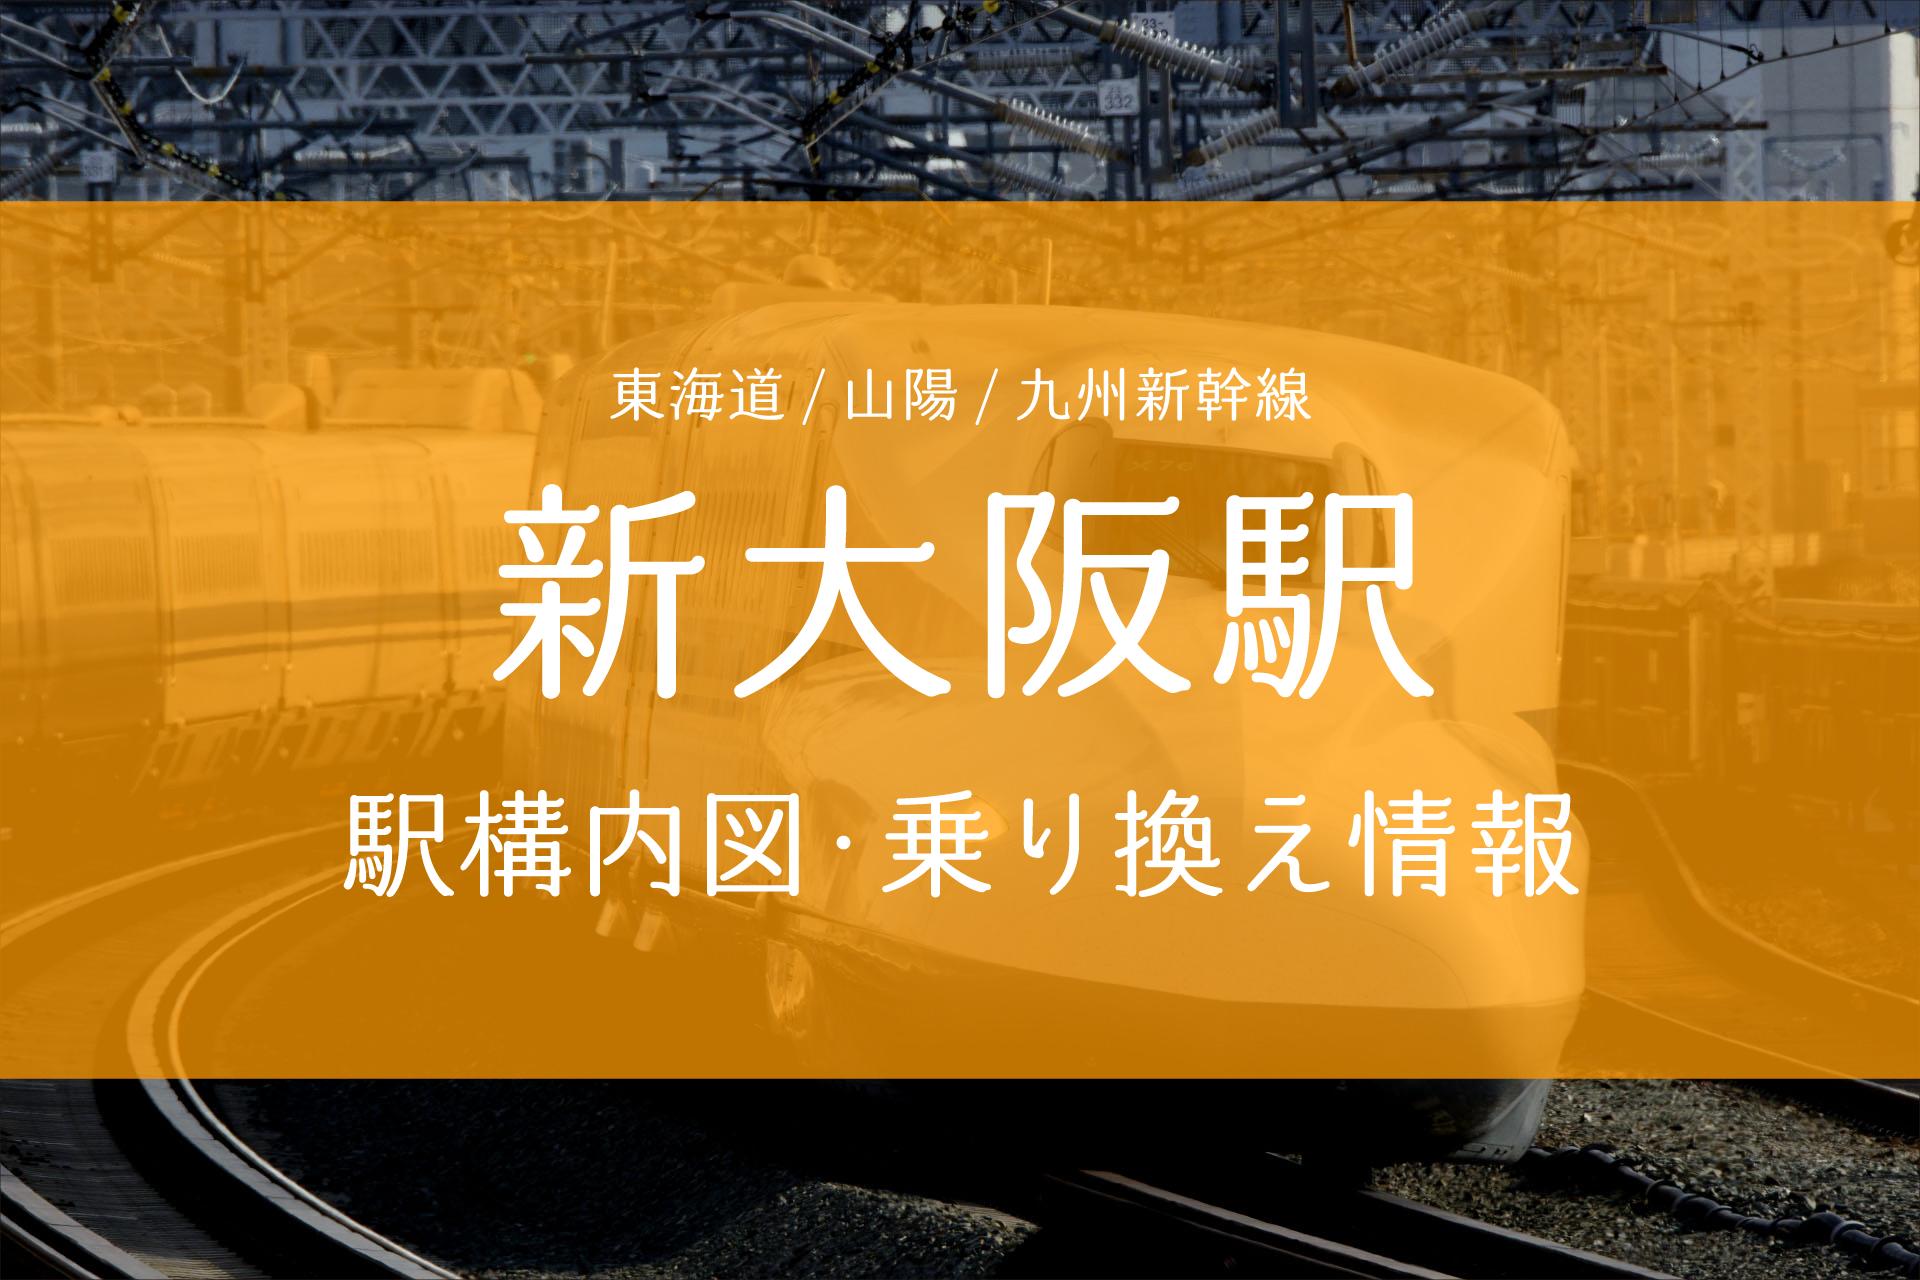 新大阪駅構内図・乗り換え情報